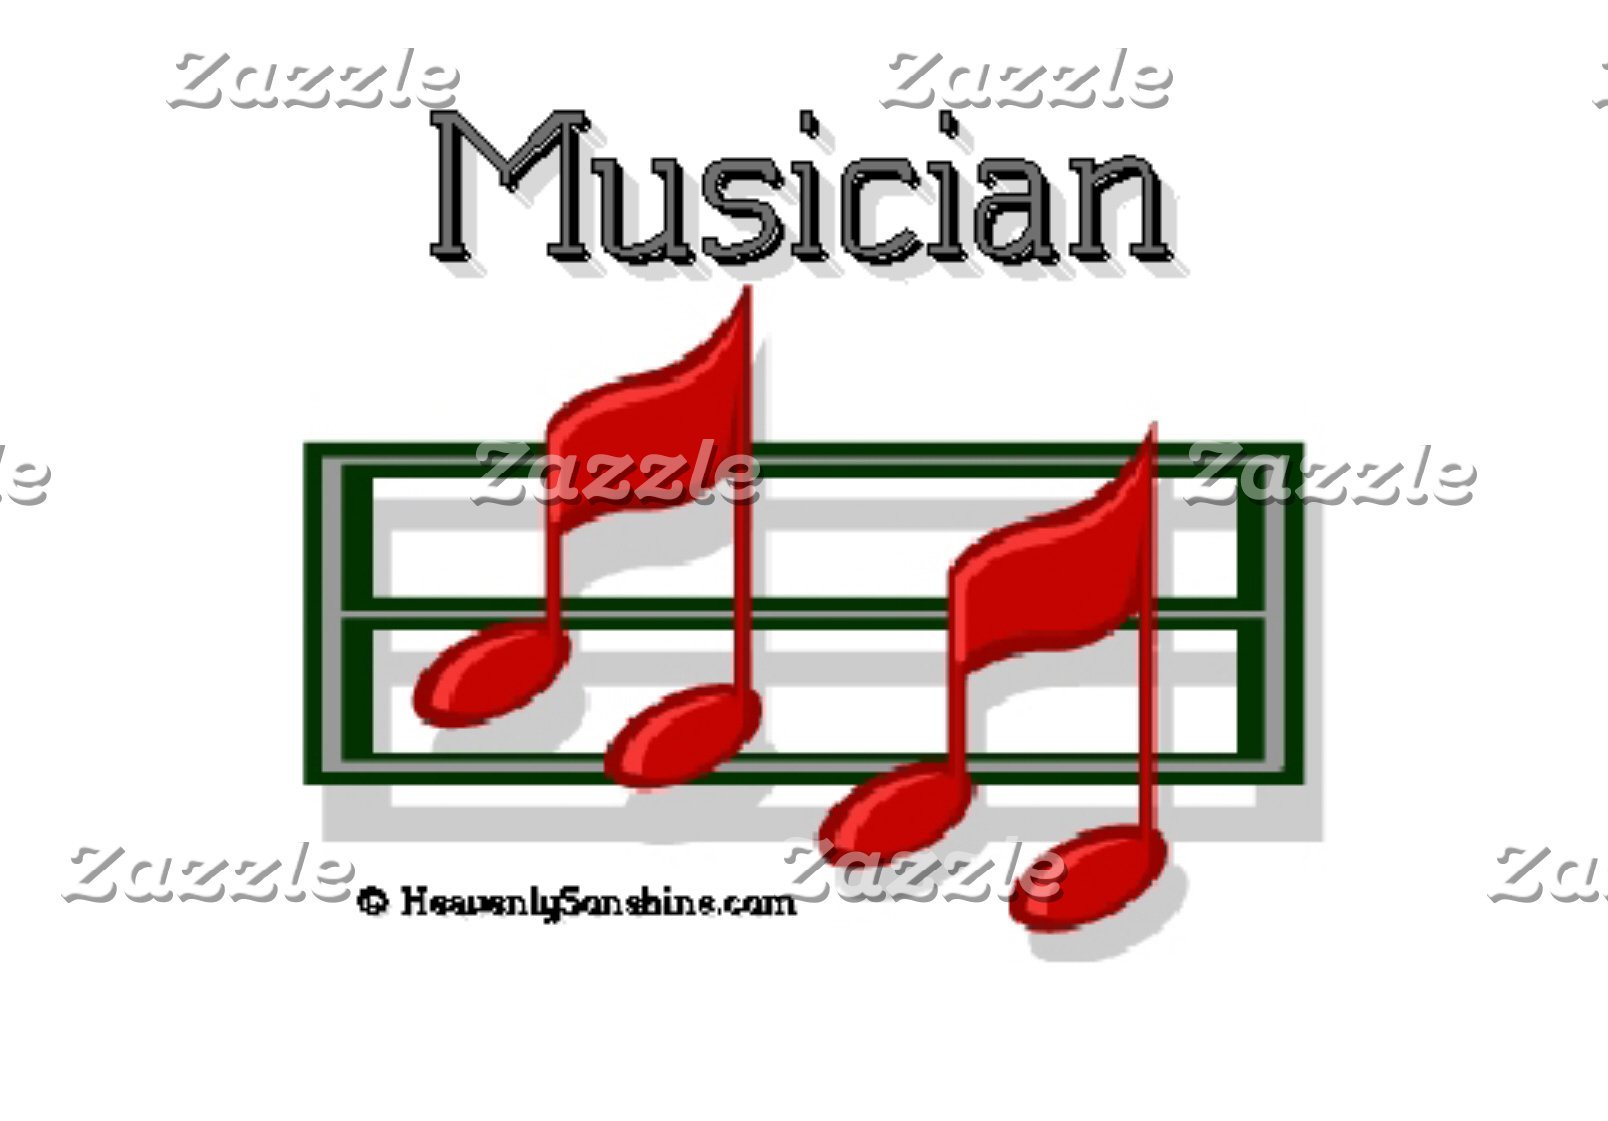 Musicians - Choir, Pianist, etc.